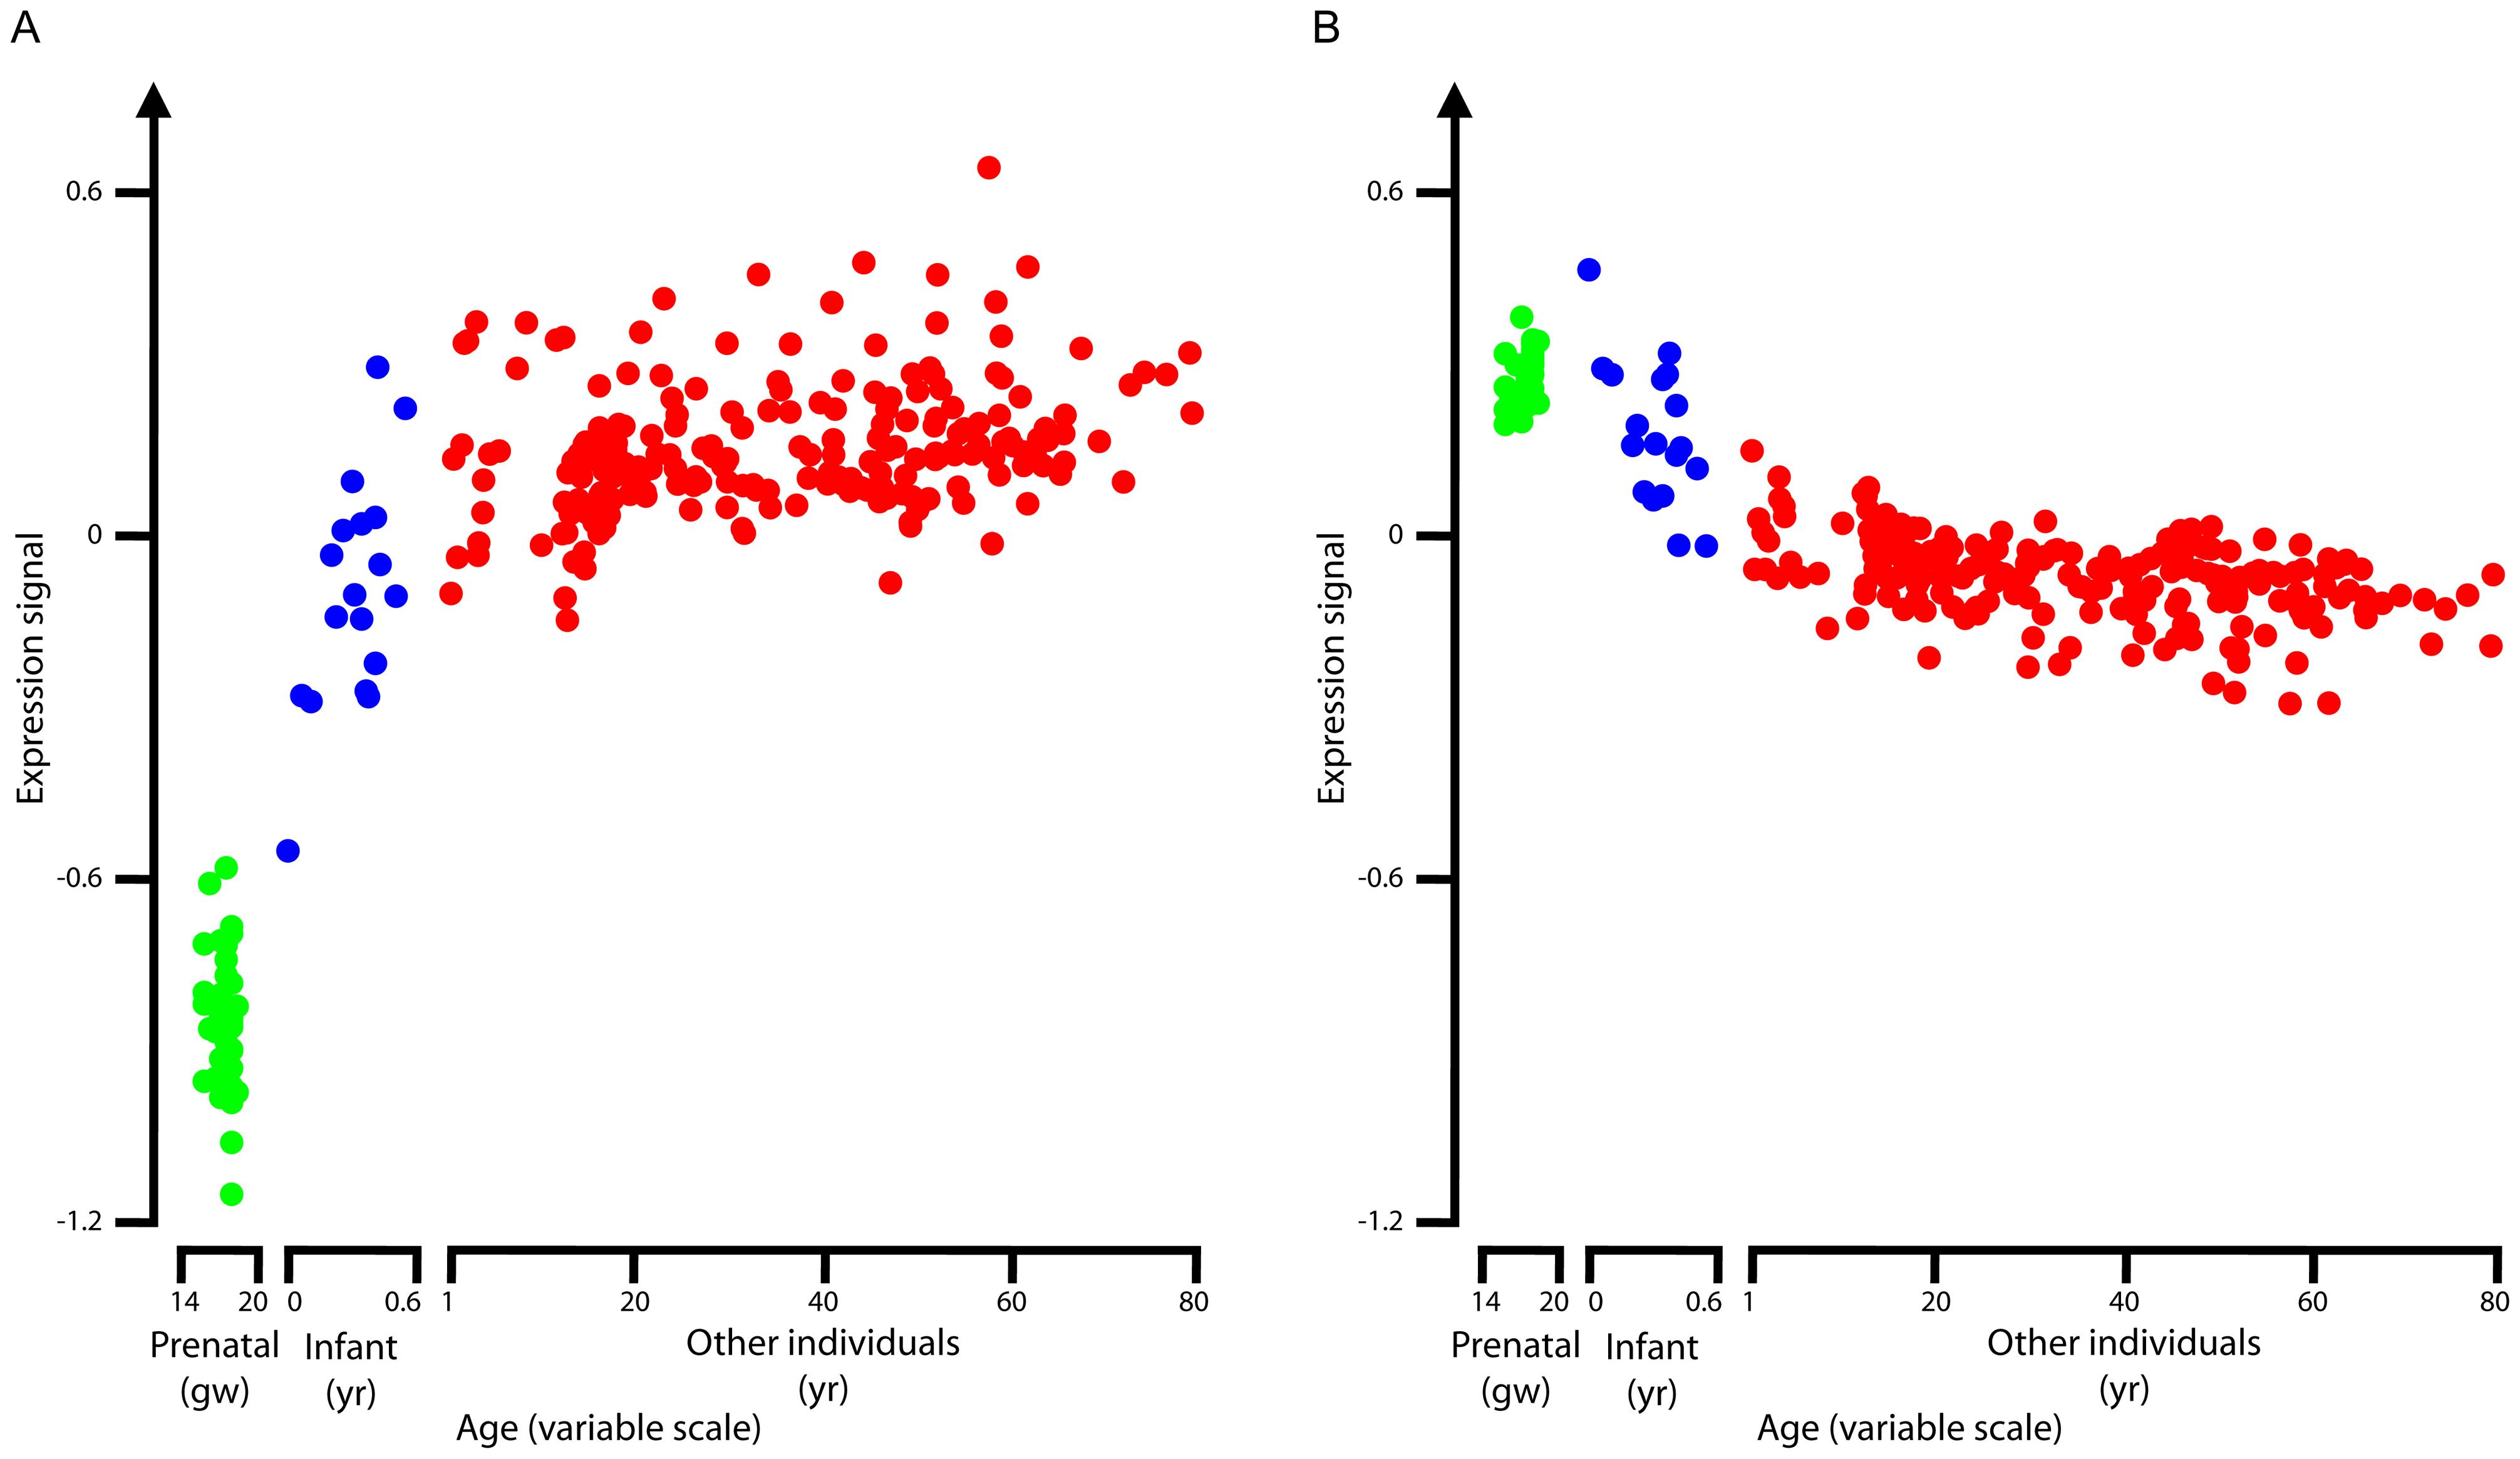 Average RNA expression levels.